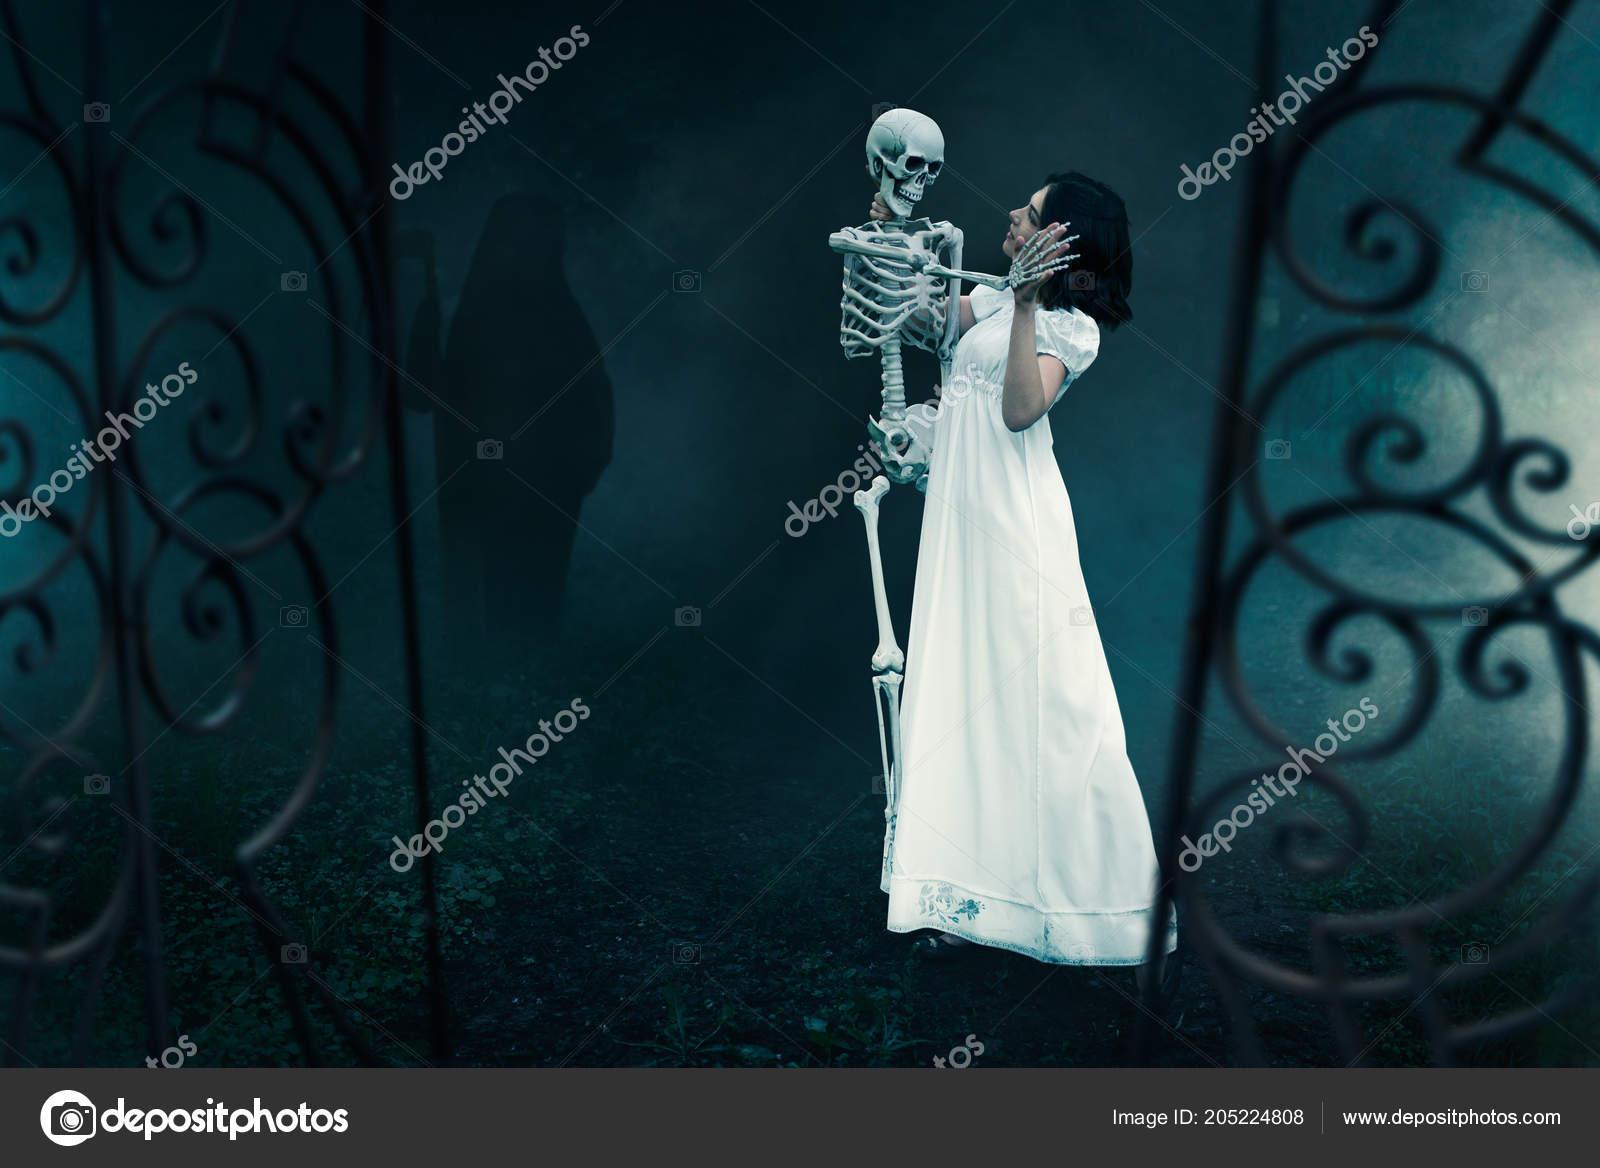 Female Victim Human Skeleton Gates Old Cemetery Night Photo Horror